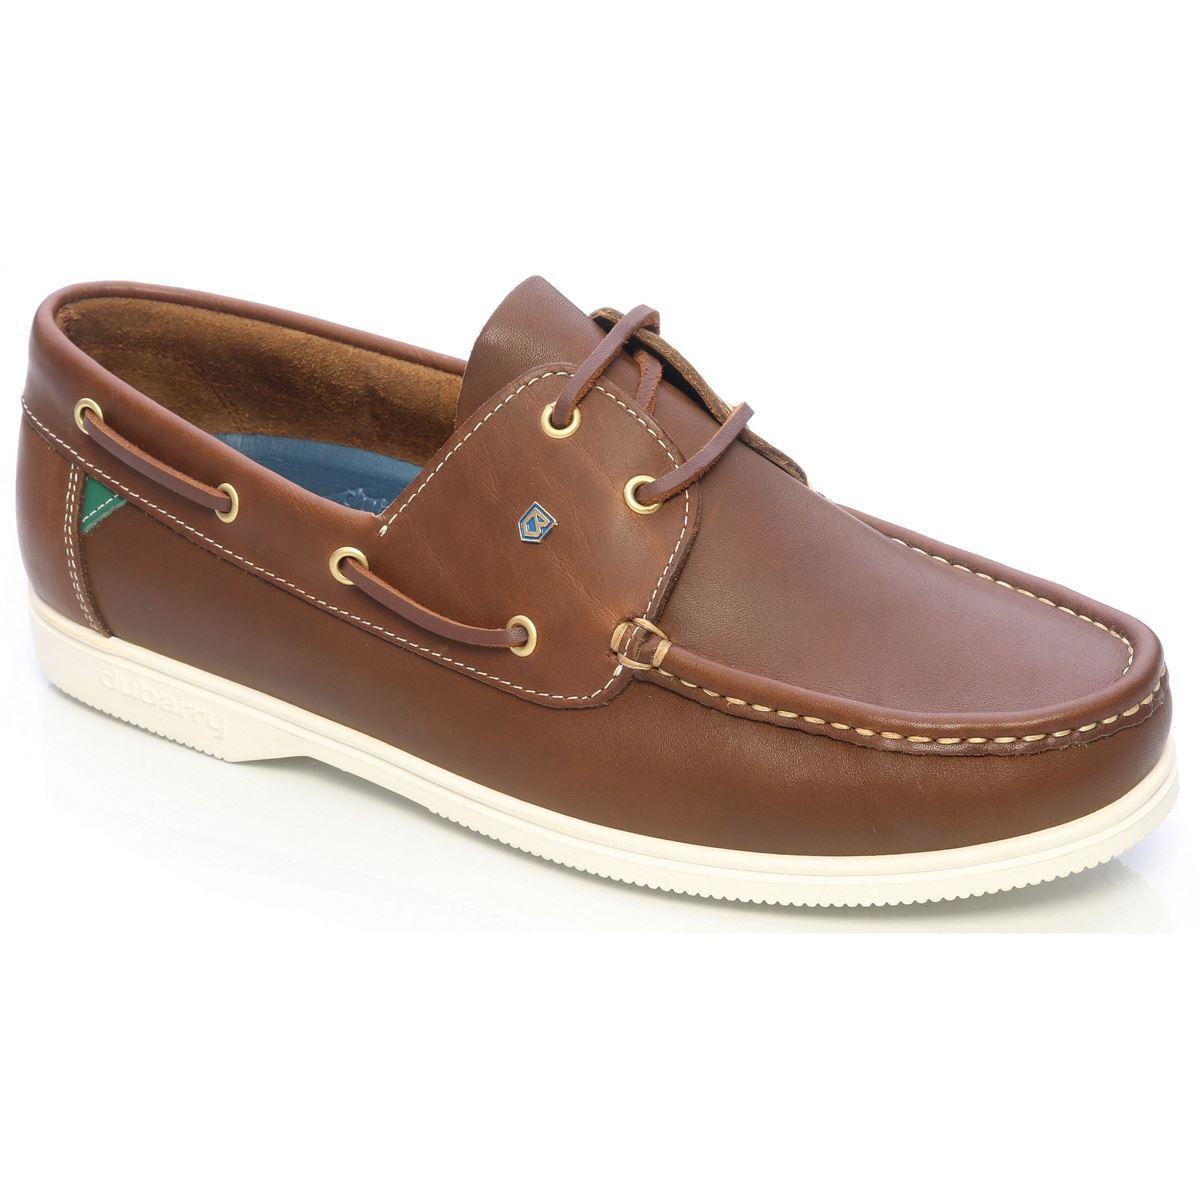 Dubarry Unisex Admirals Deck Shoe Brown 8 (EU42)